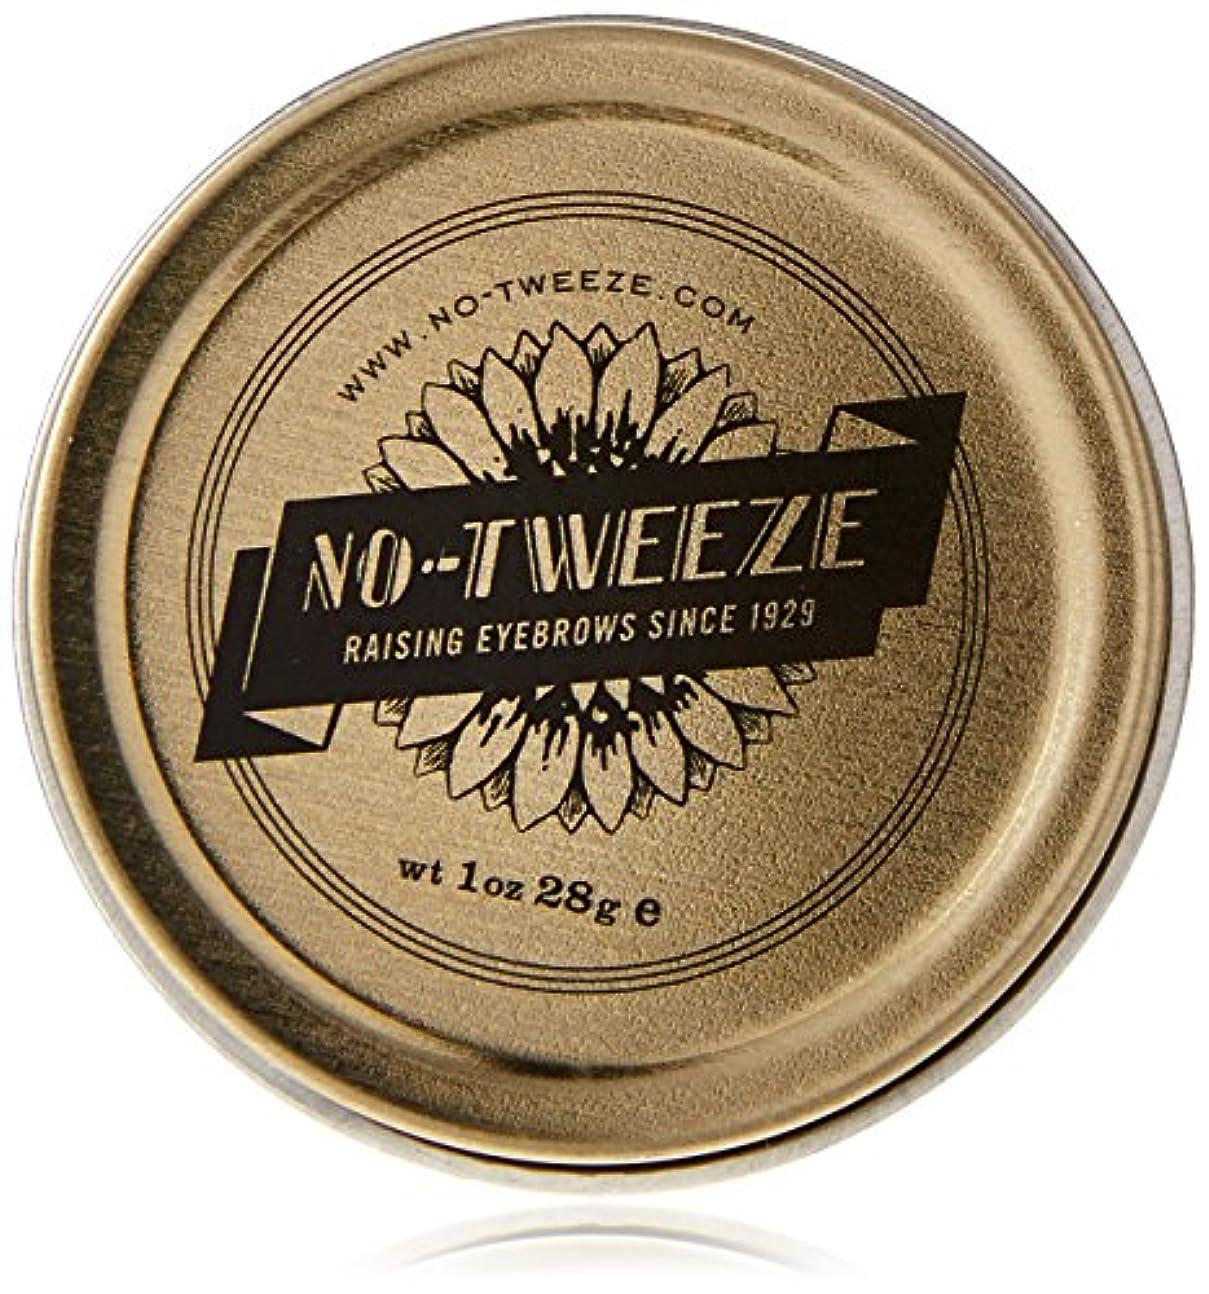 土床面倒No-Tweeze 28g by No-Tweeze